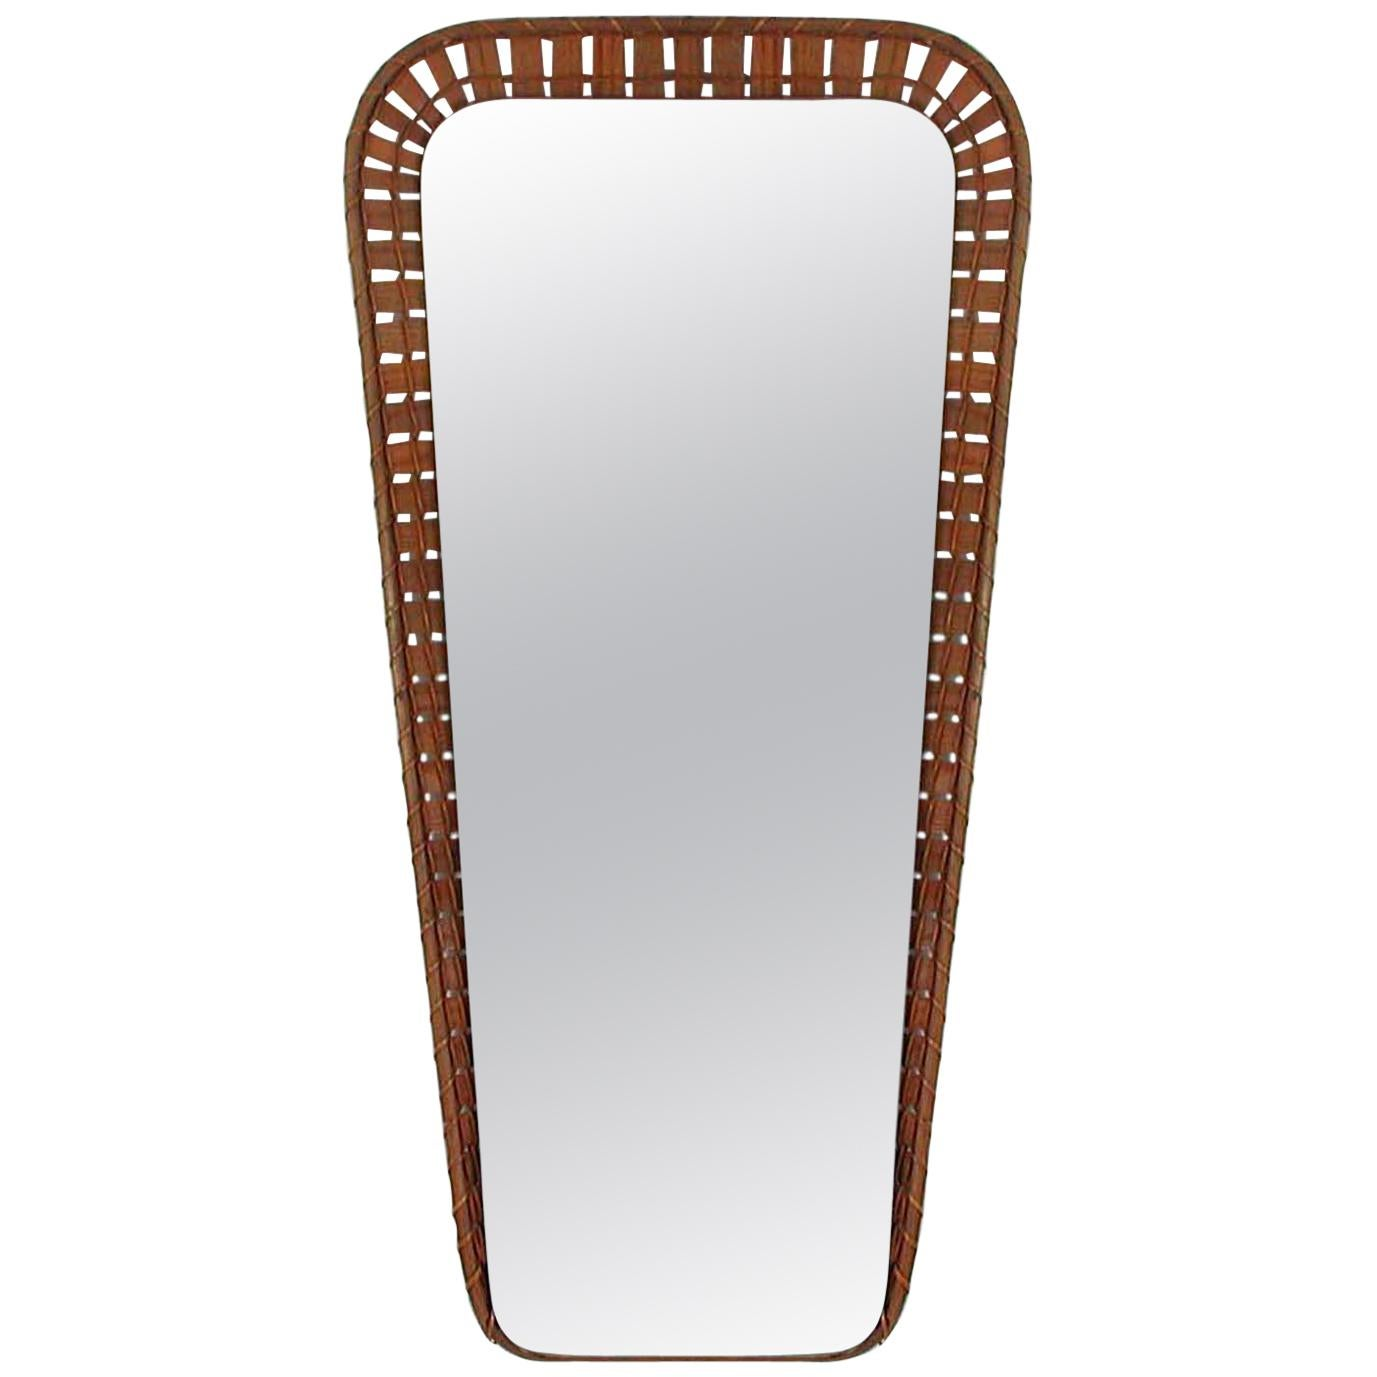 Swedish Midcentury Conical Rattan Wall Mirror, 1950s